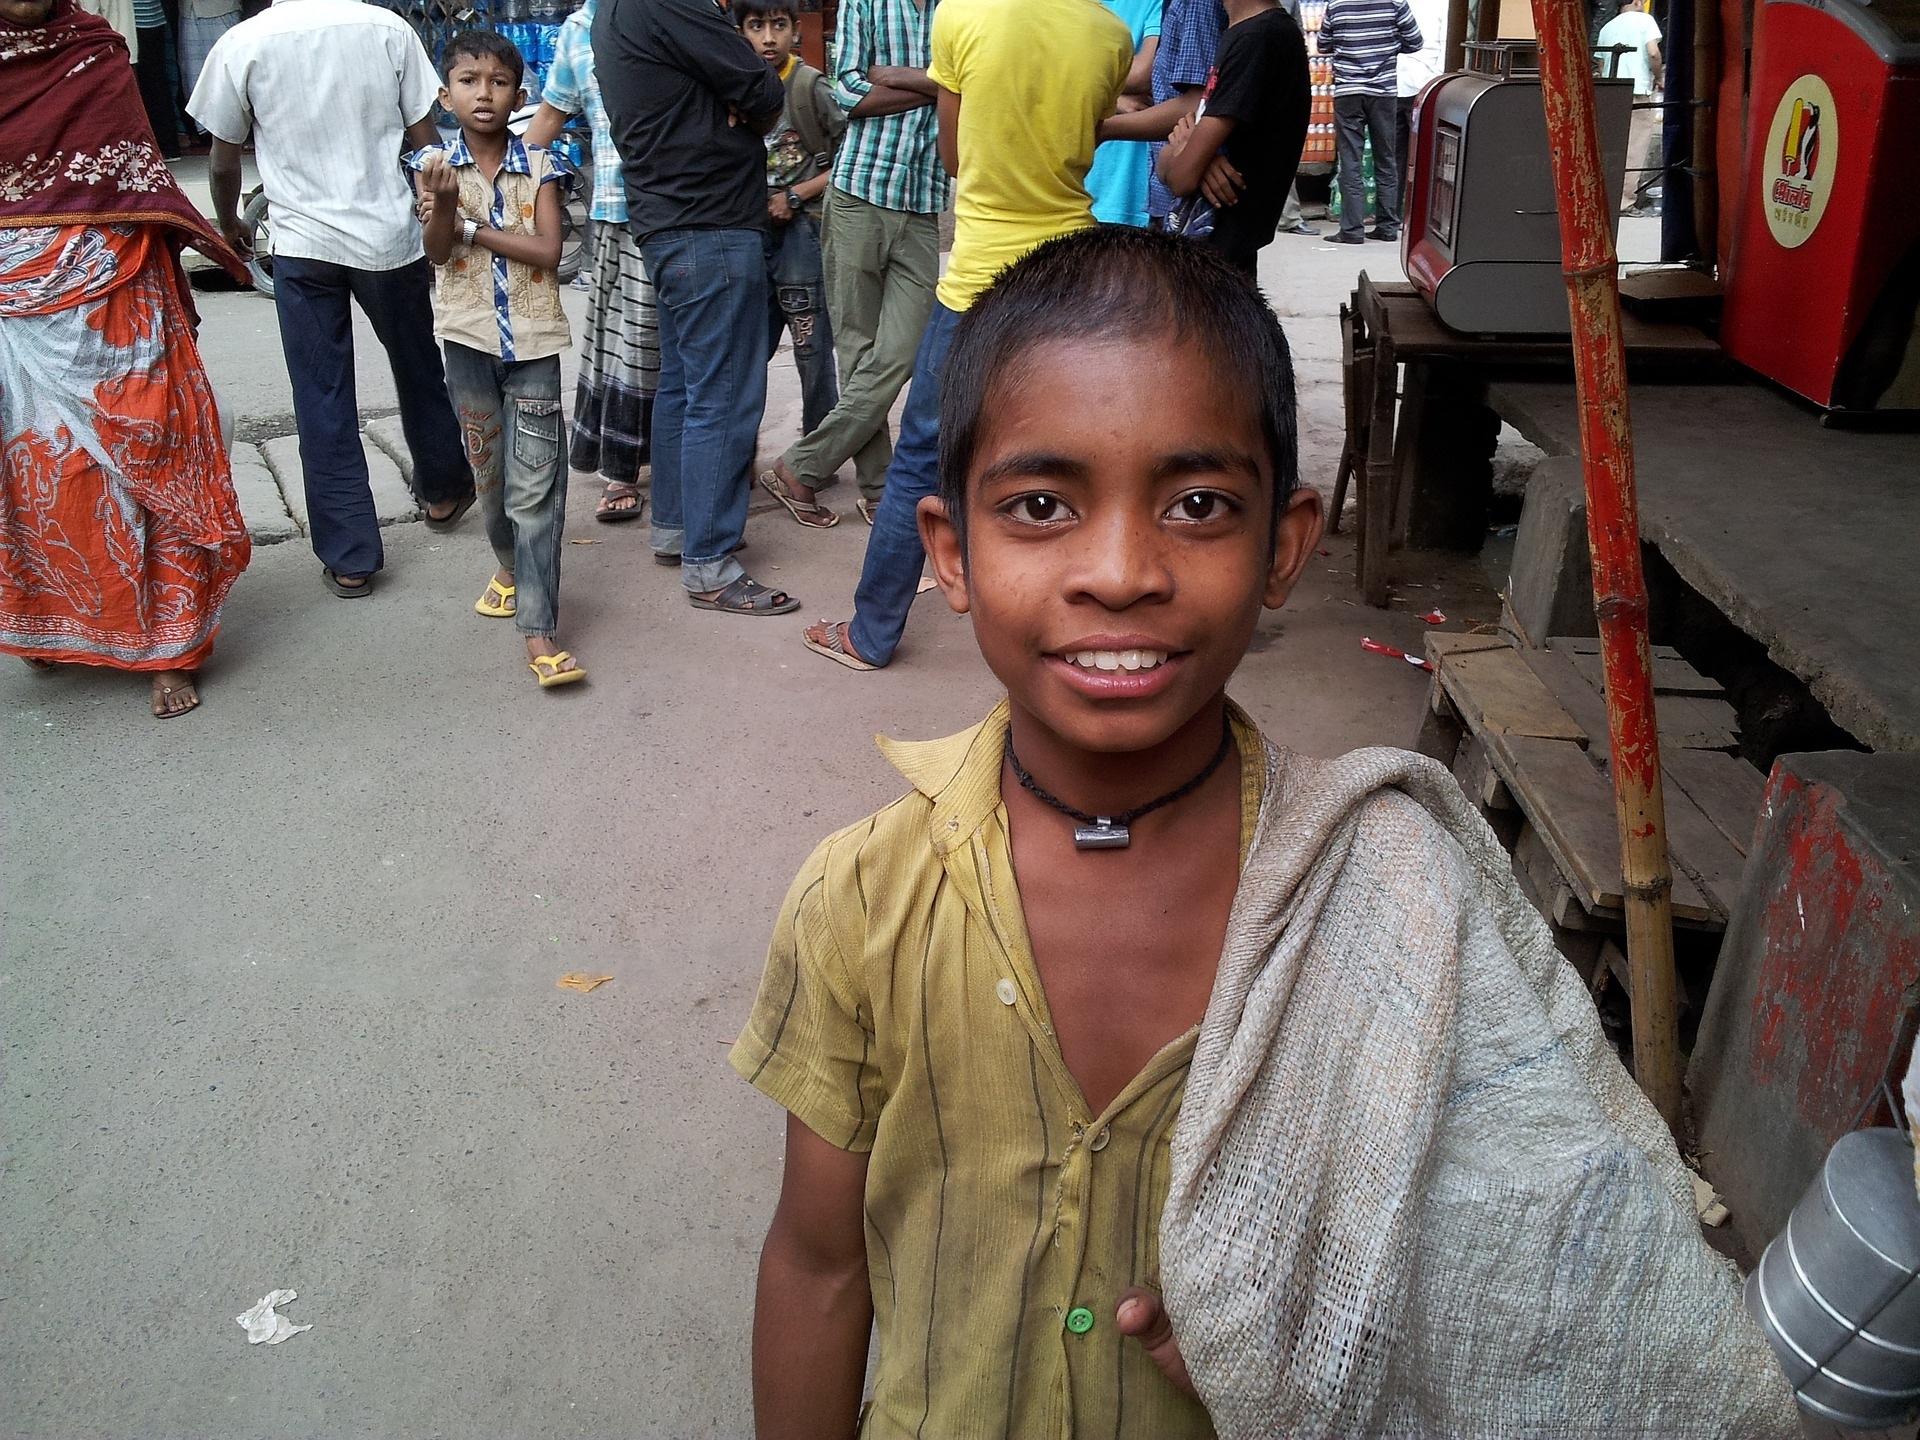 Boy on the streets of Bangladesh